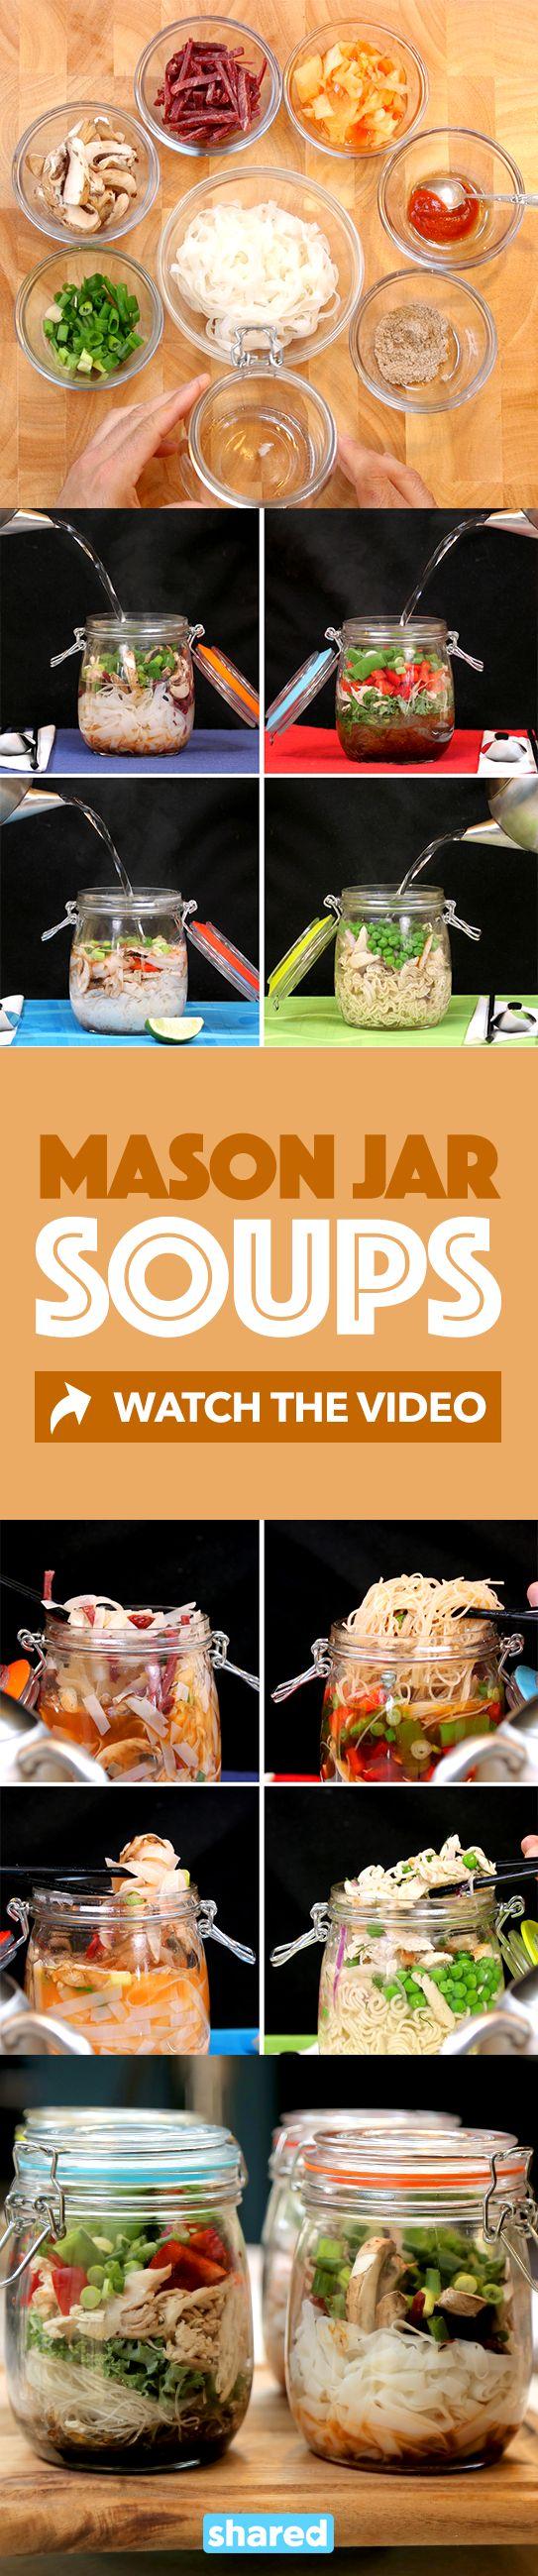 Mason Jar Soup 4 Ways